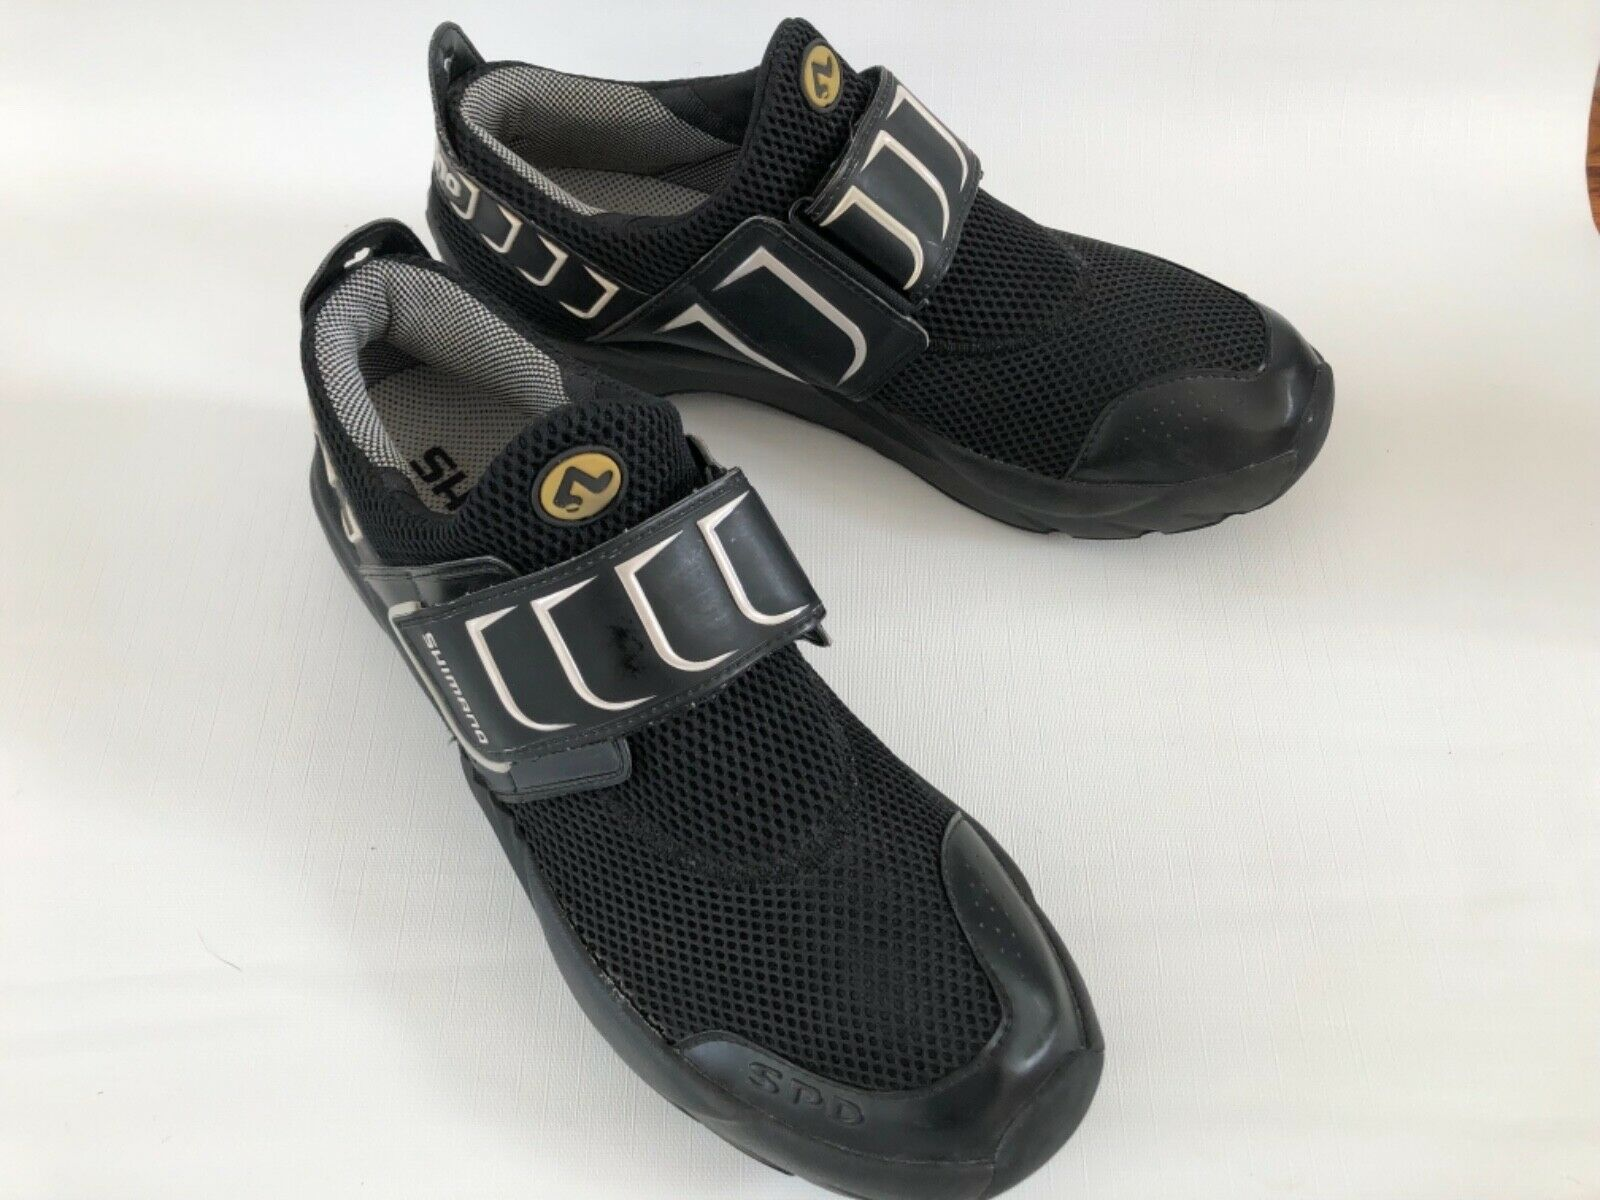 Shimano SH-FN01  SPD Slip On Strap Bike Cycling Cleats shoes Men's Sz 12.5  2018 latest